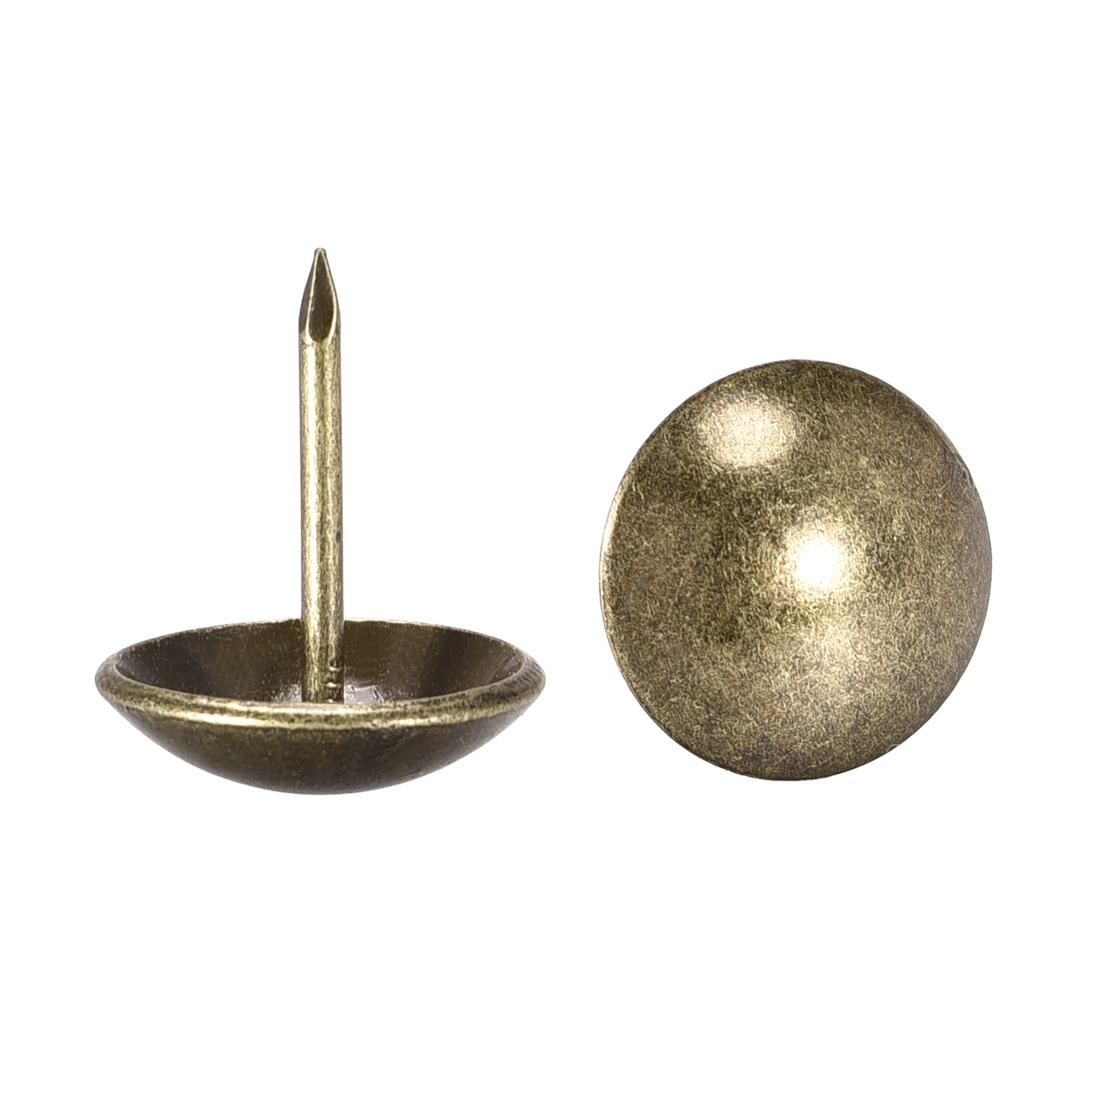 Upholstery Nails Tacks 19mm Dia 23mm Height Round Push Pins Bronze Tone 80 Pcs